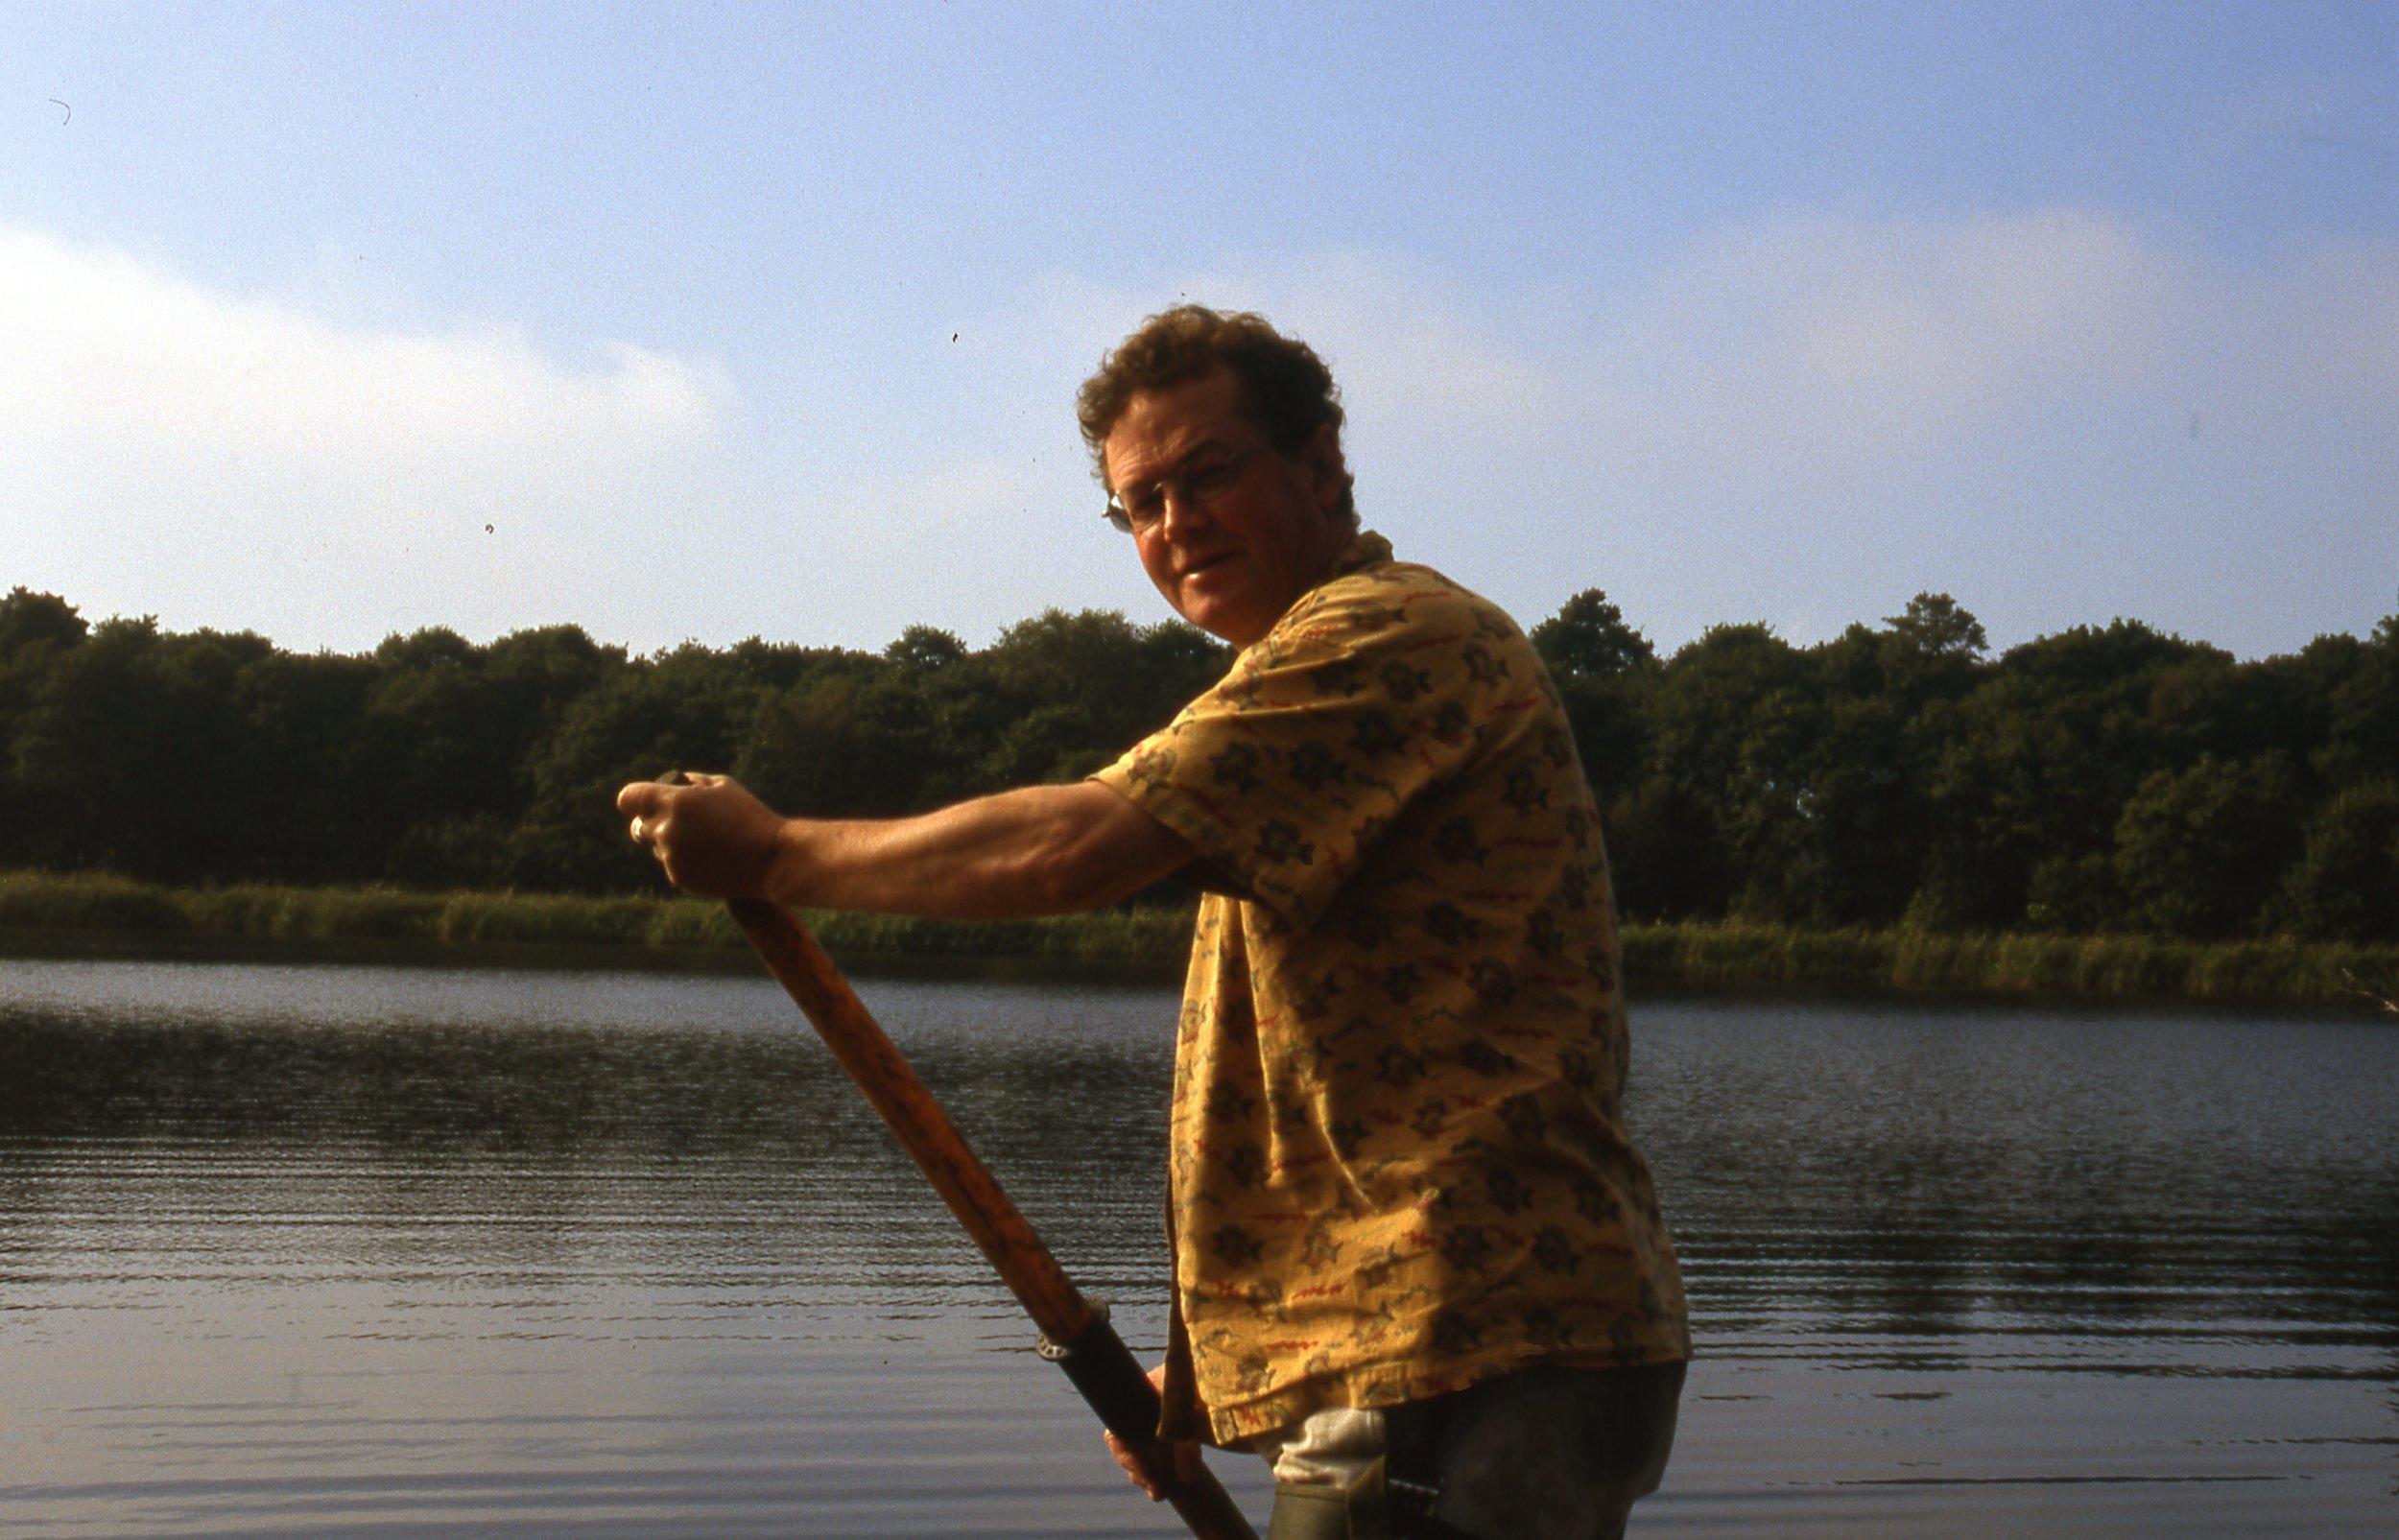 Me Punting - Alderfen Broad - 1st Oct 2000.jpg